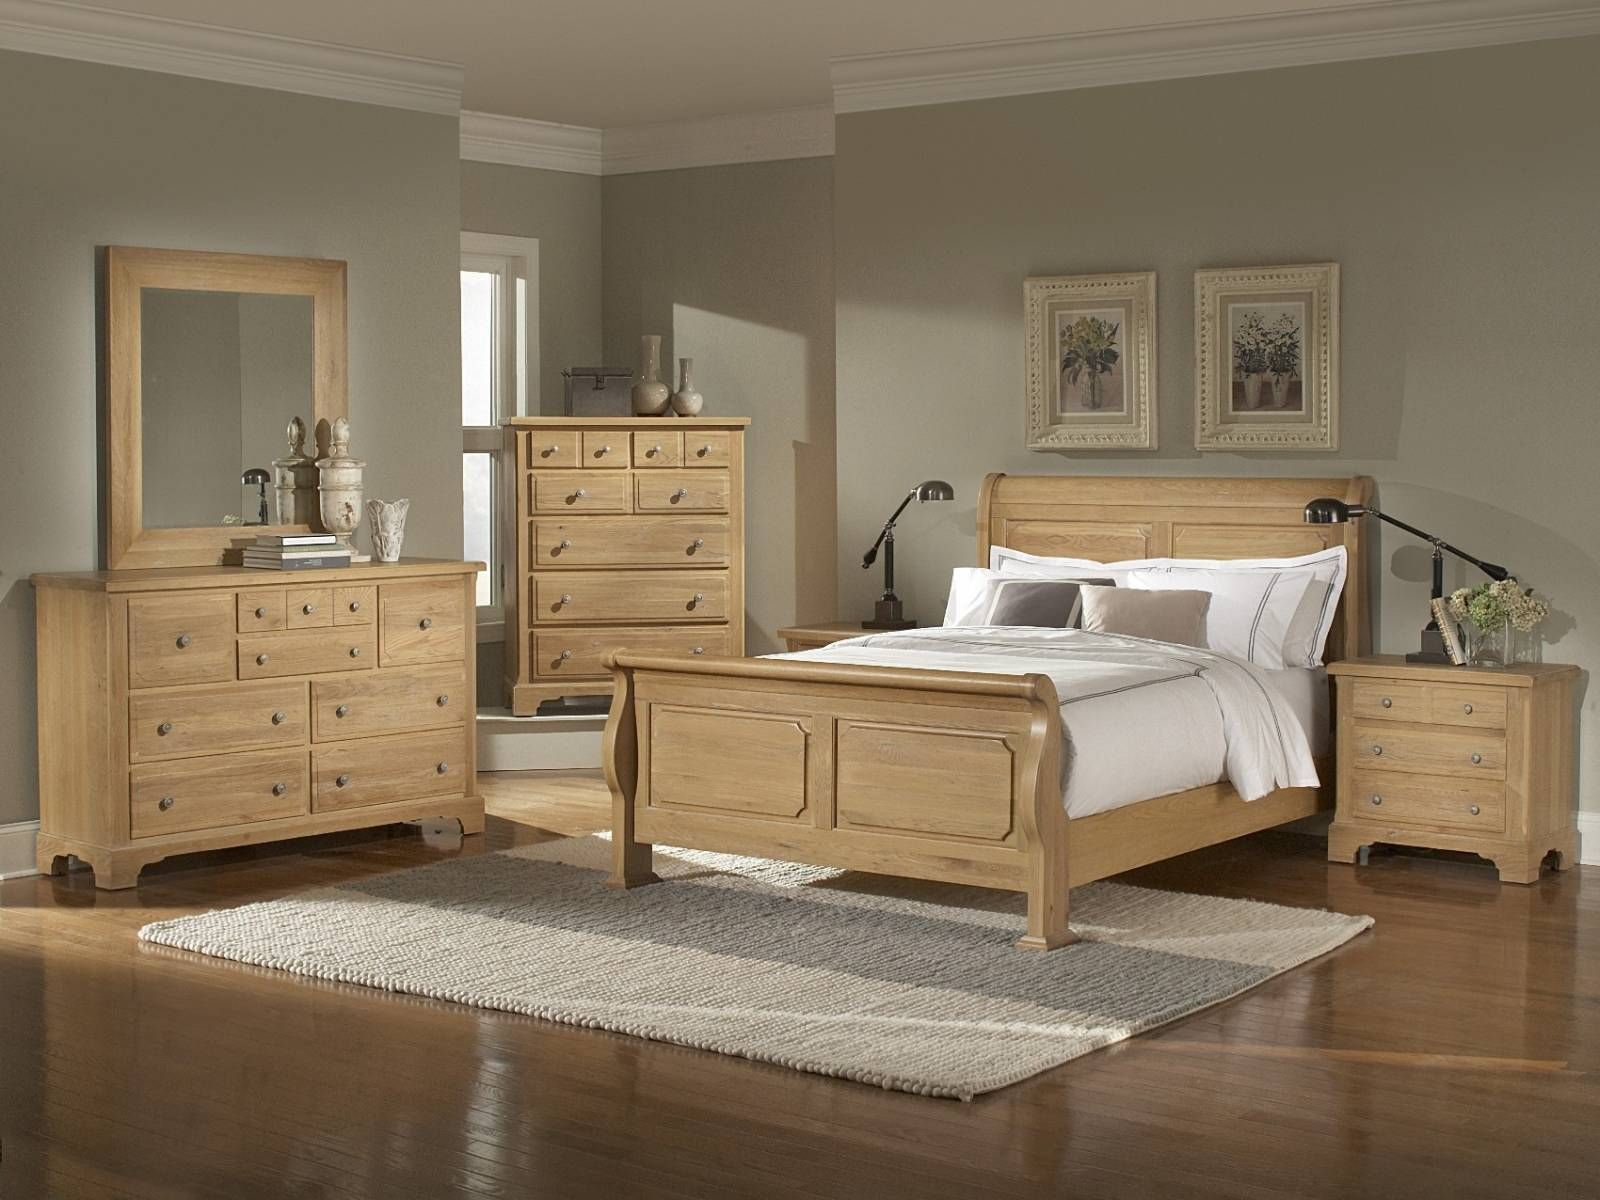 Light Brown Bedroom Ideas Part - 17: Bedroom Ideas For Light Wood Furniture